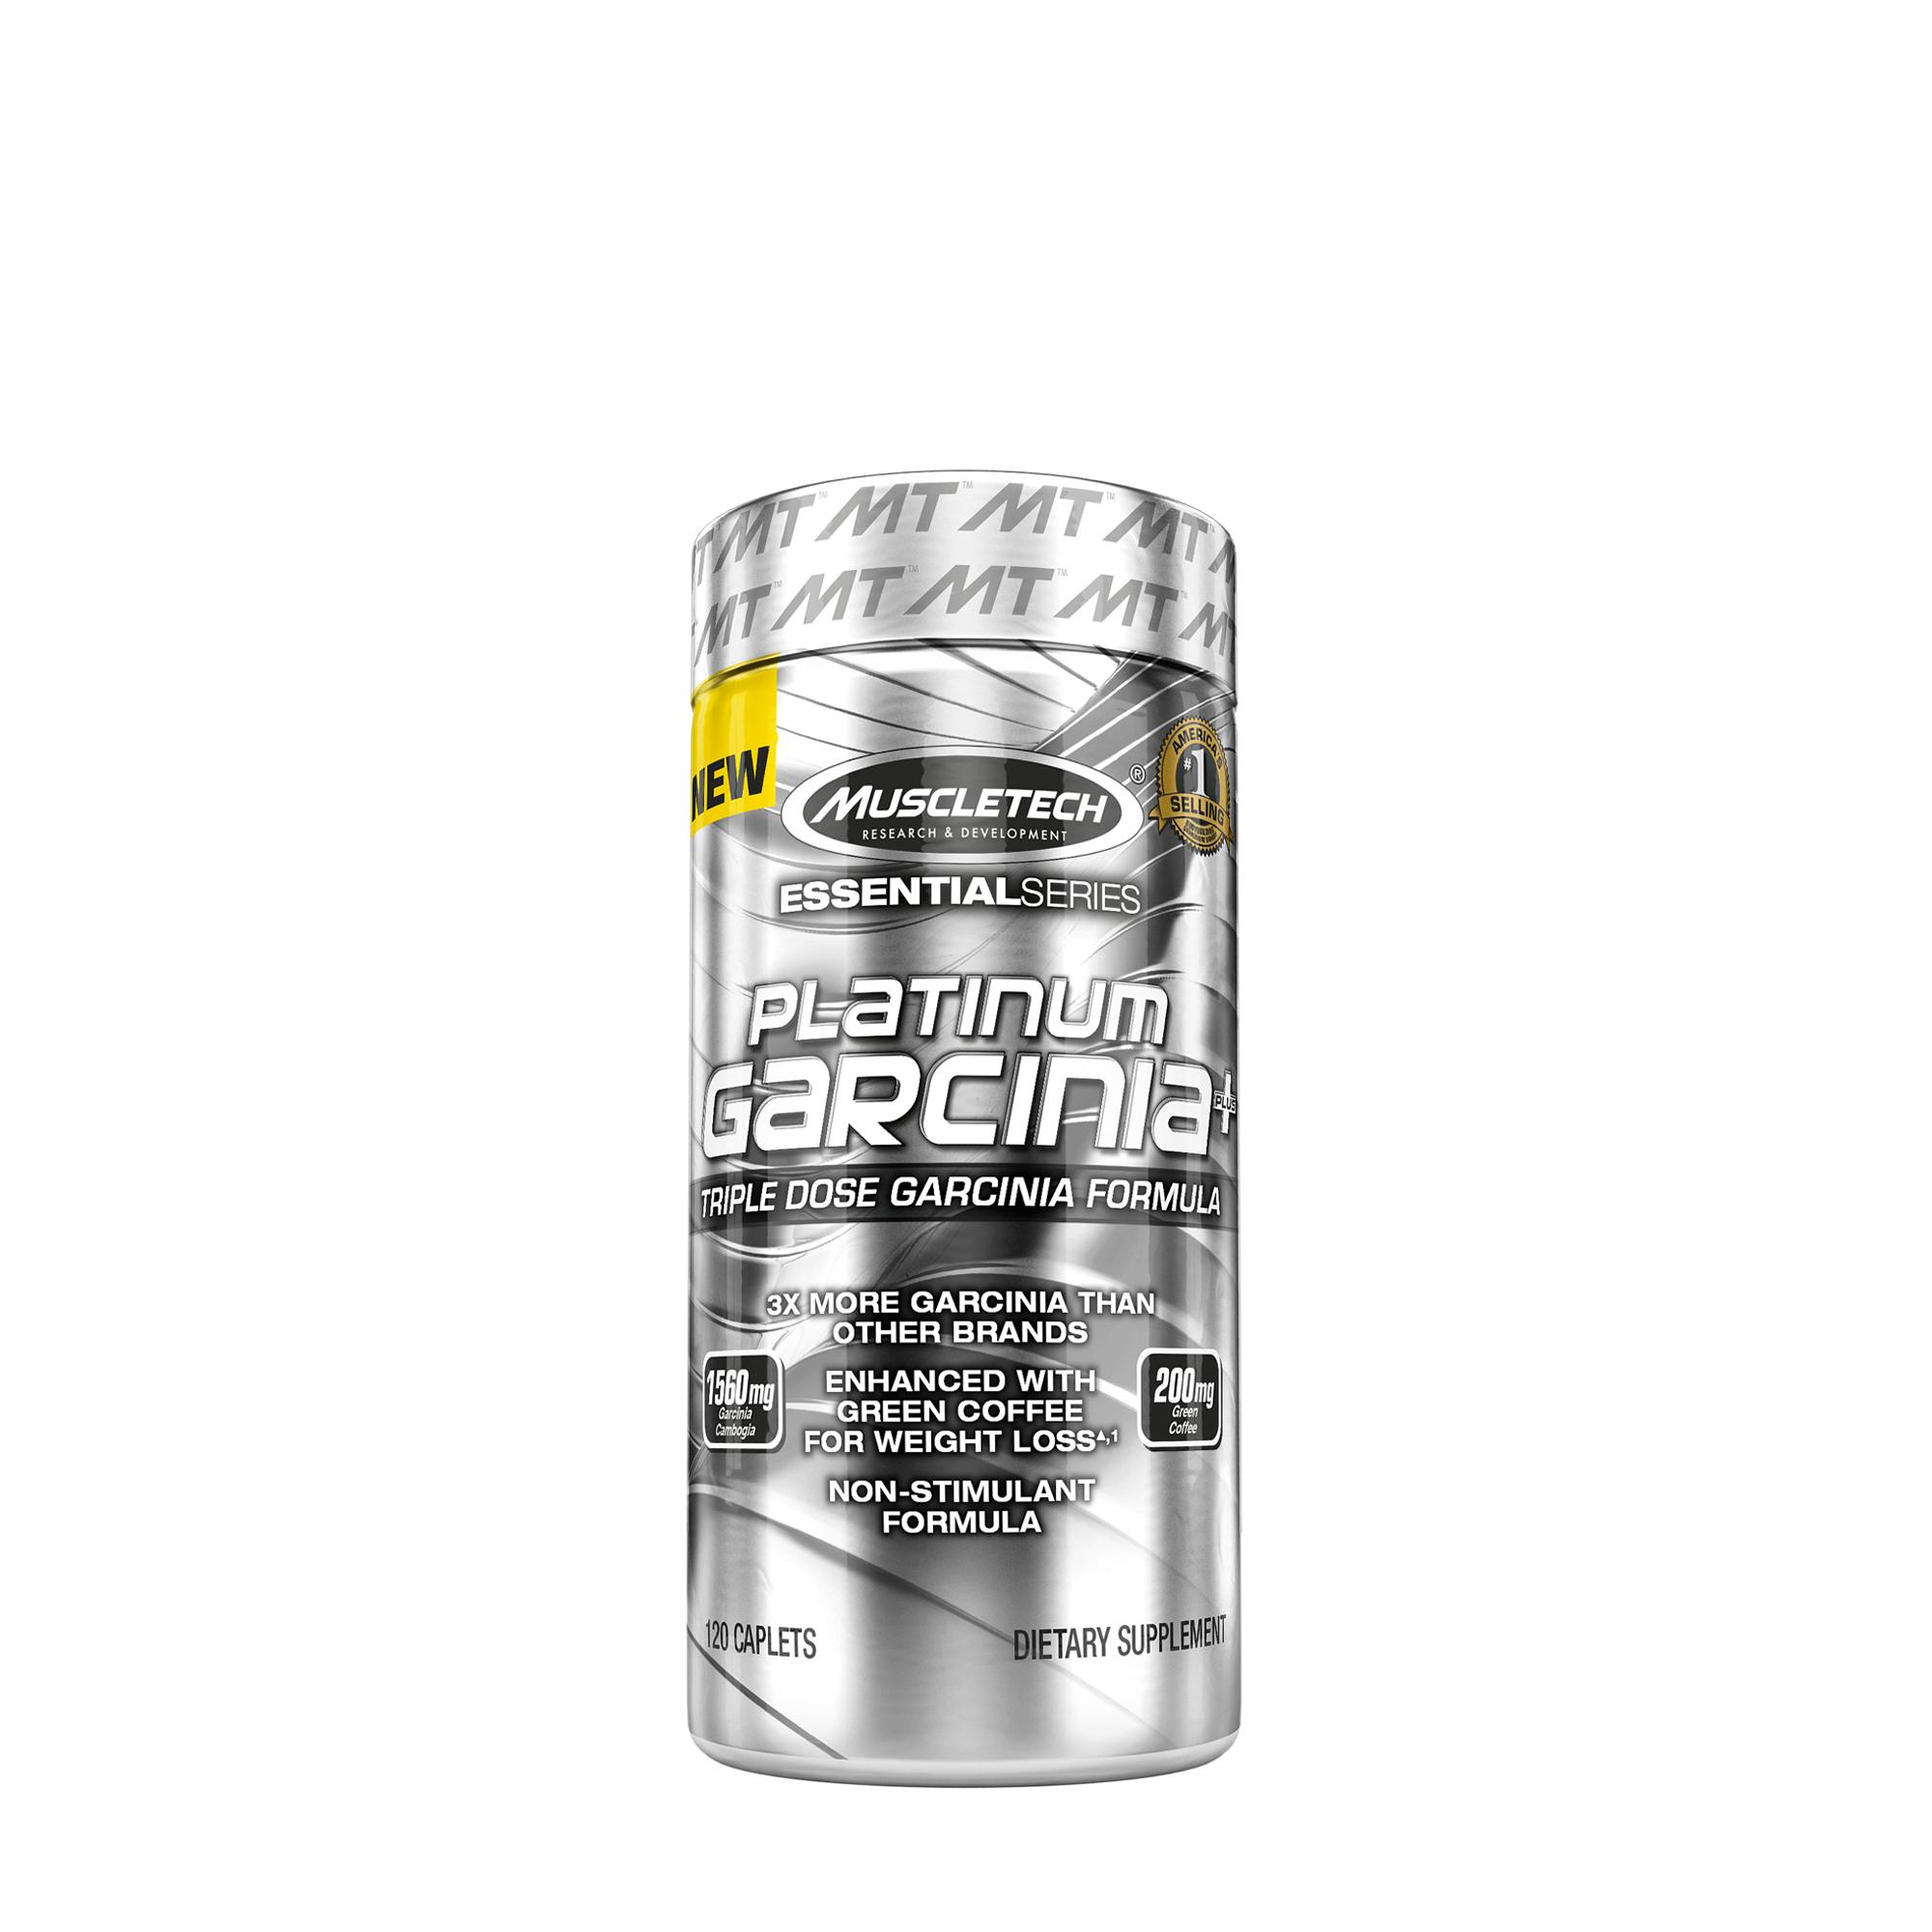 Muscletech Platinum Garcinia Plus Gnc Bcaa Essential Series